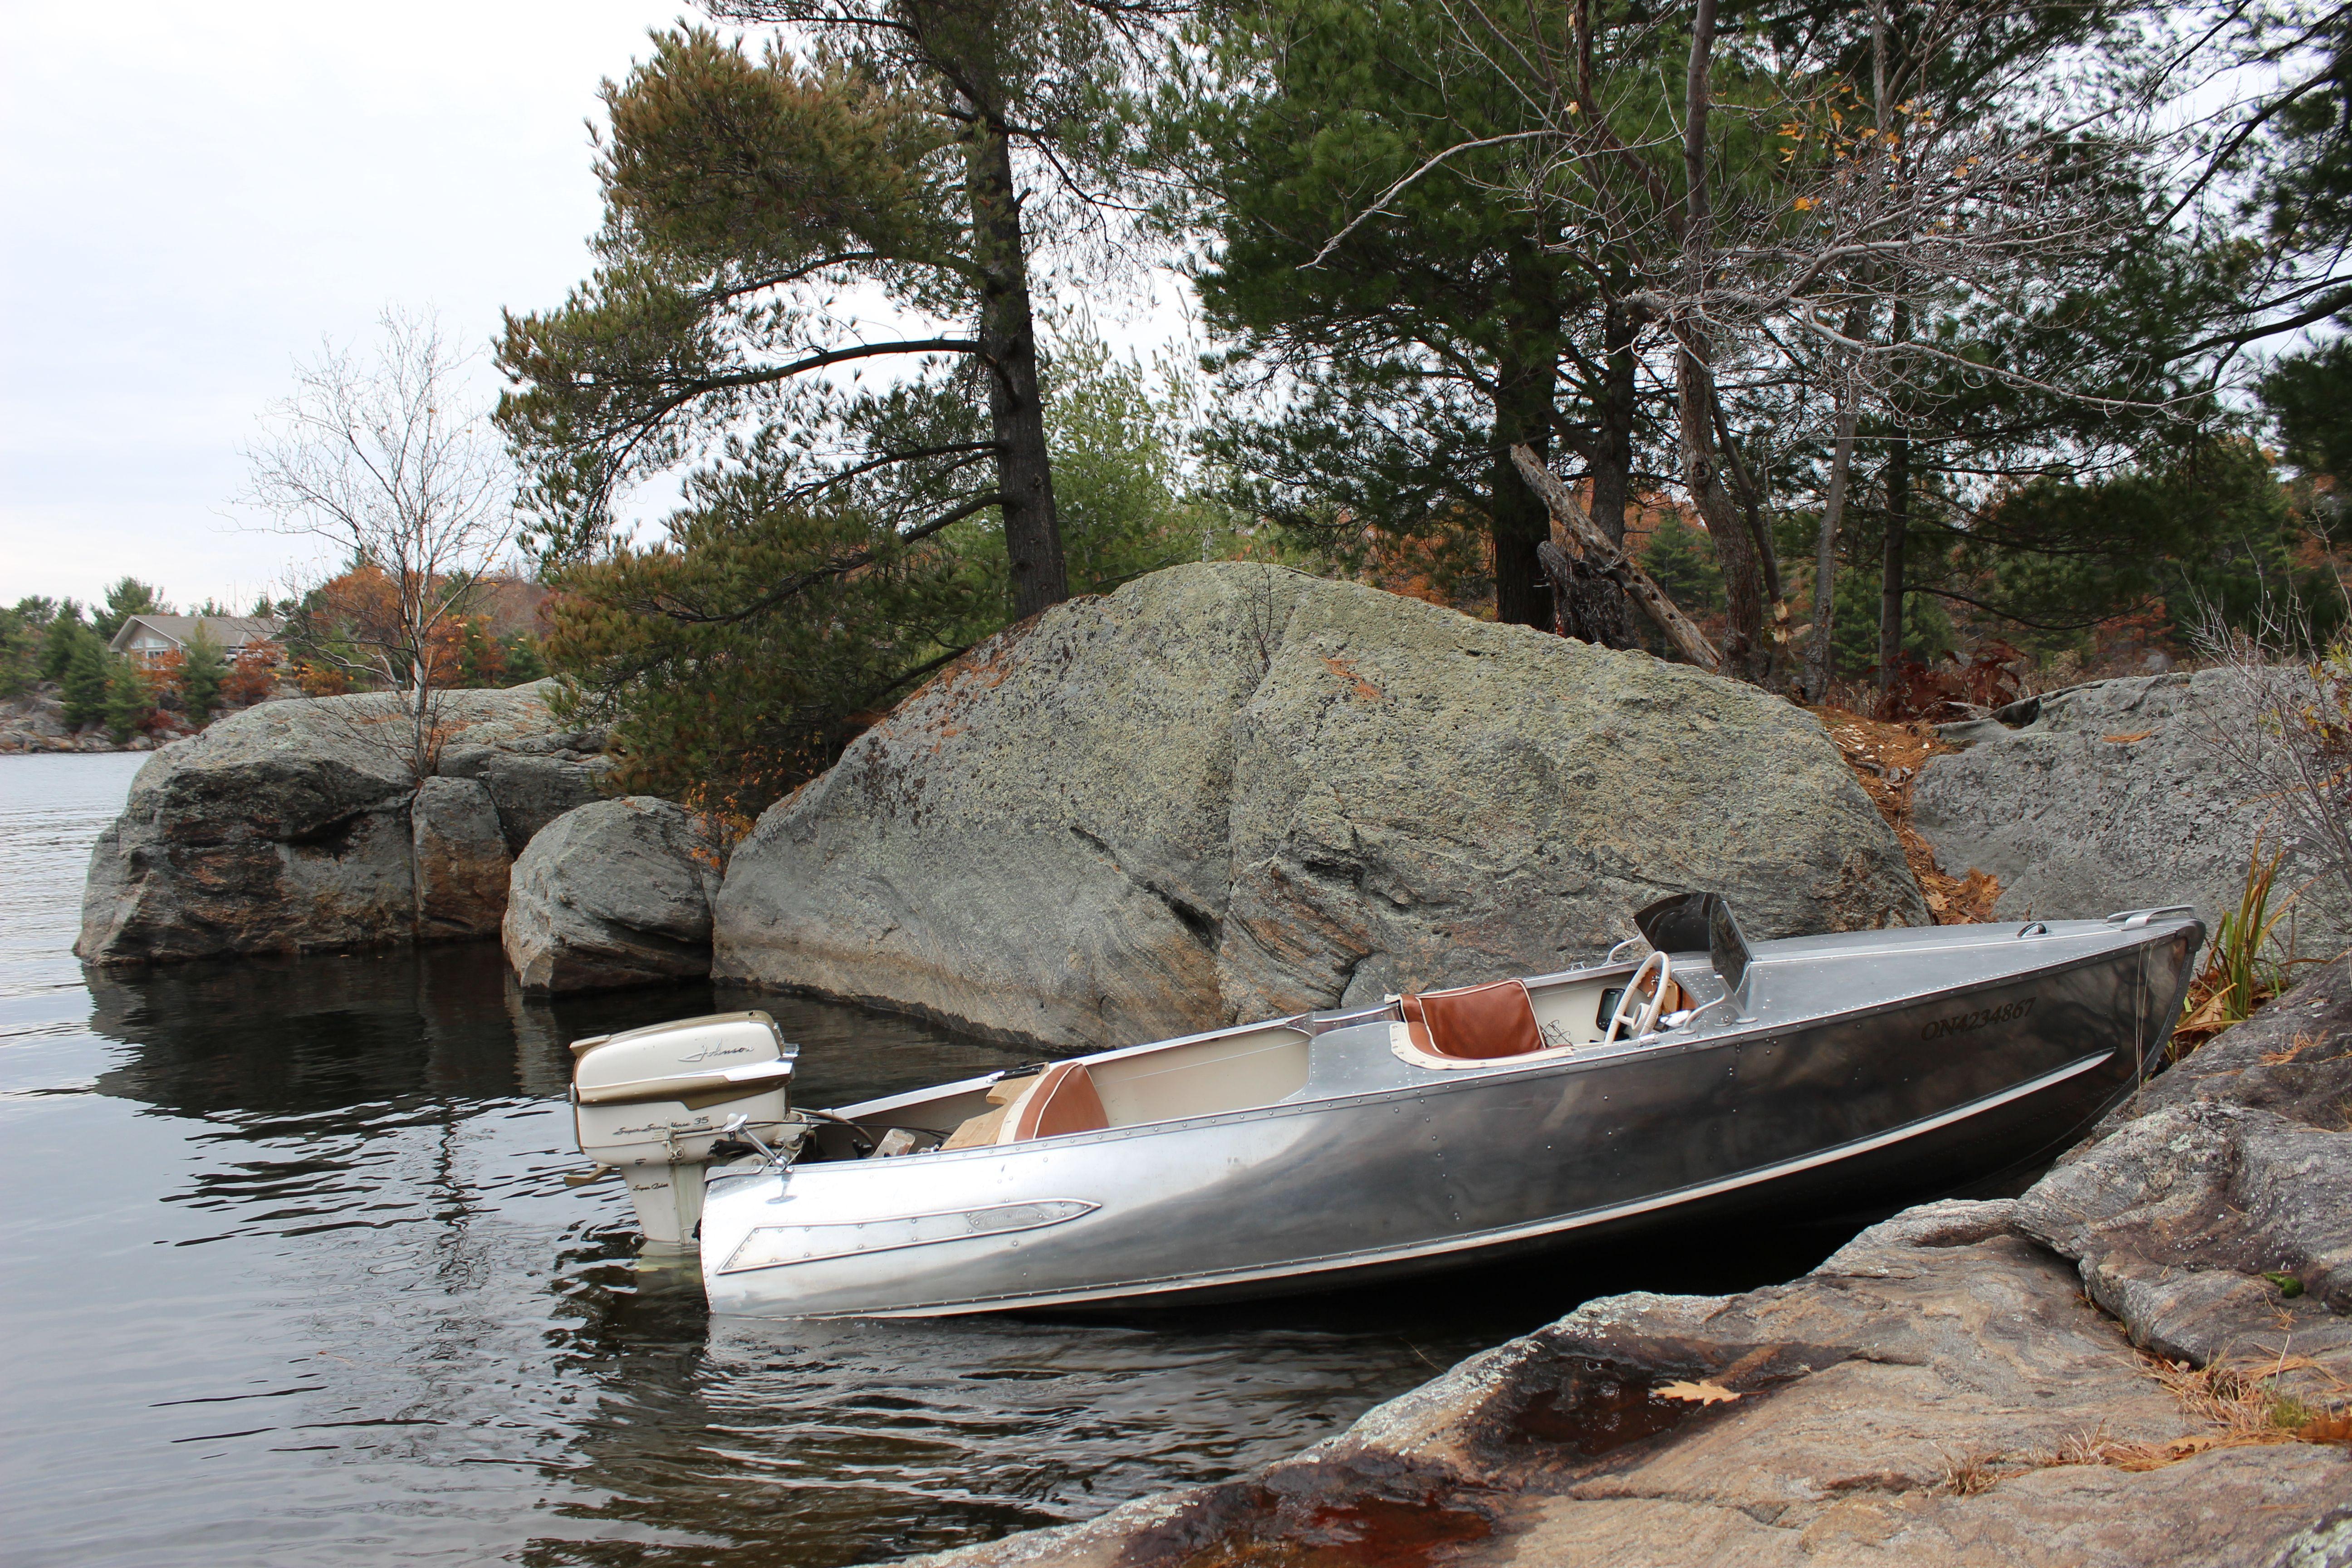 July 2015 Feathercraft Kayaks - Year of Clean Water